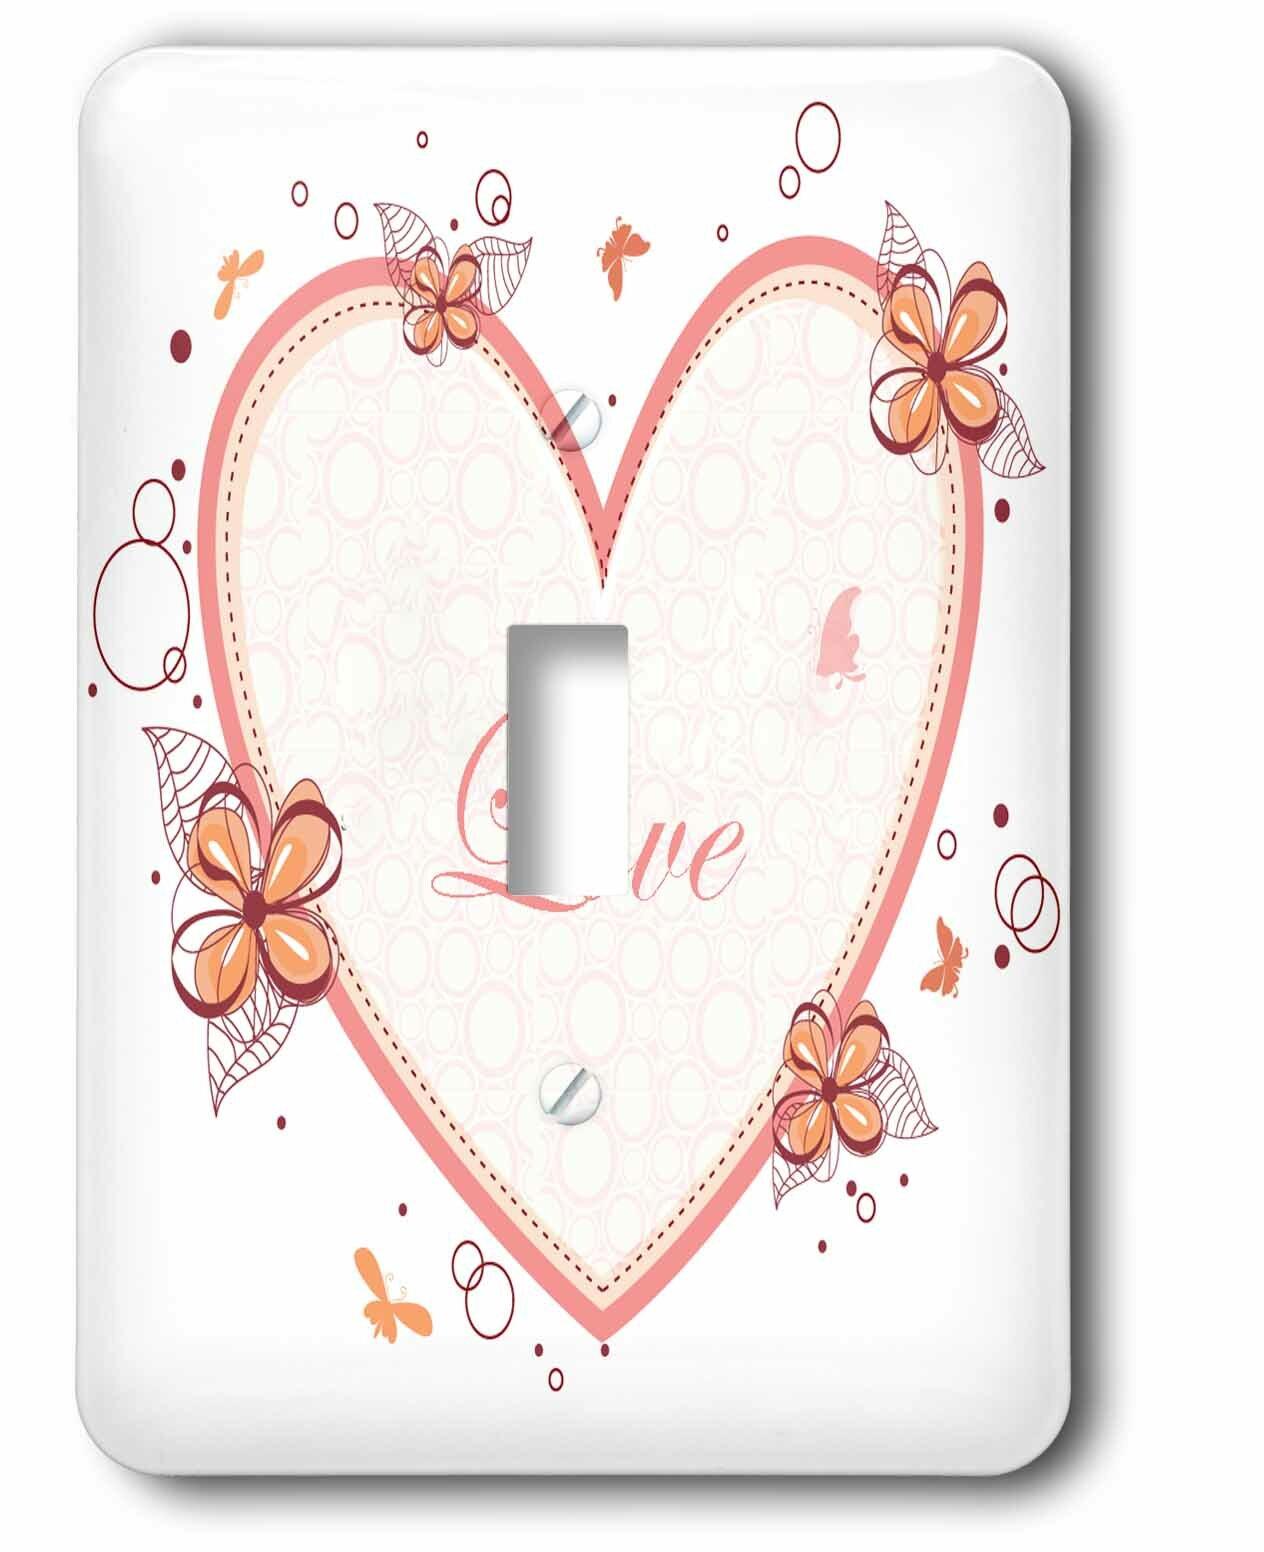 3drose A Heart 1 Gang Toggle Light Switch Wall Plate Wayfair